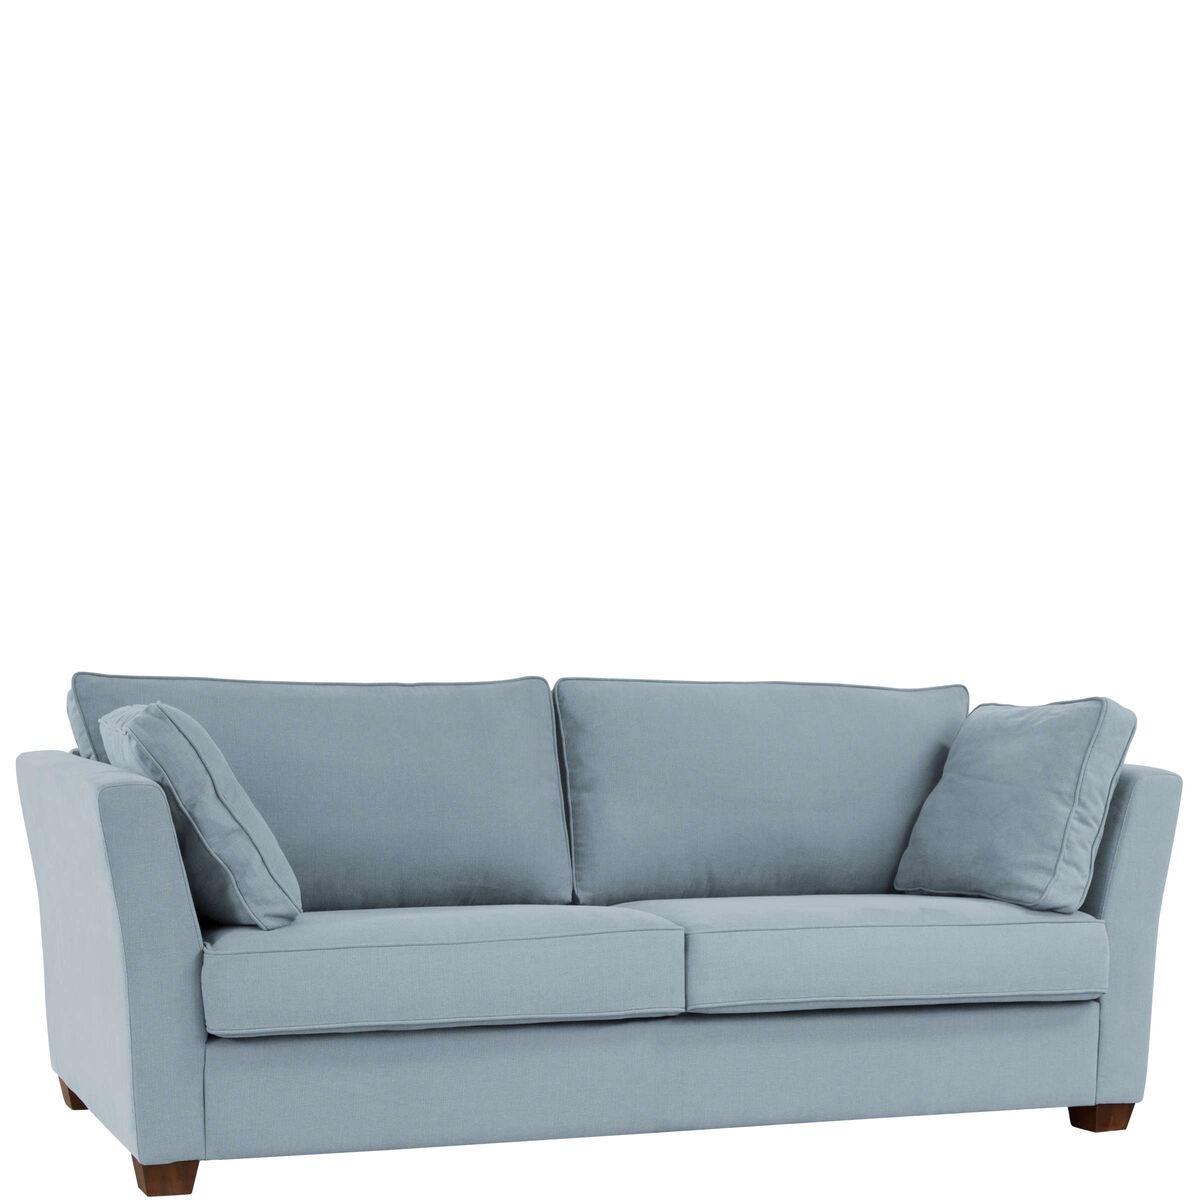 Full Size of Sofa 2 5 Sitzer Suite Blau Sitzmbel Butlers Bett Mit Bettkasten 160x200 Boxspring Schlaffunktion Betten 140x200 200x200 180x200 Paletten Schlafsofa Sofa Sofa 2 5 Sitzer